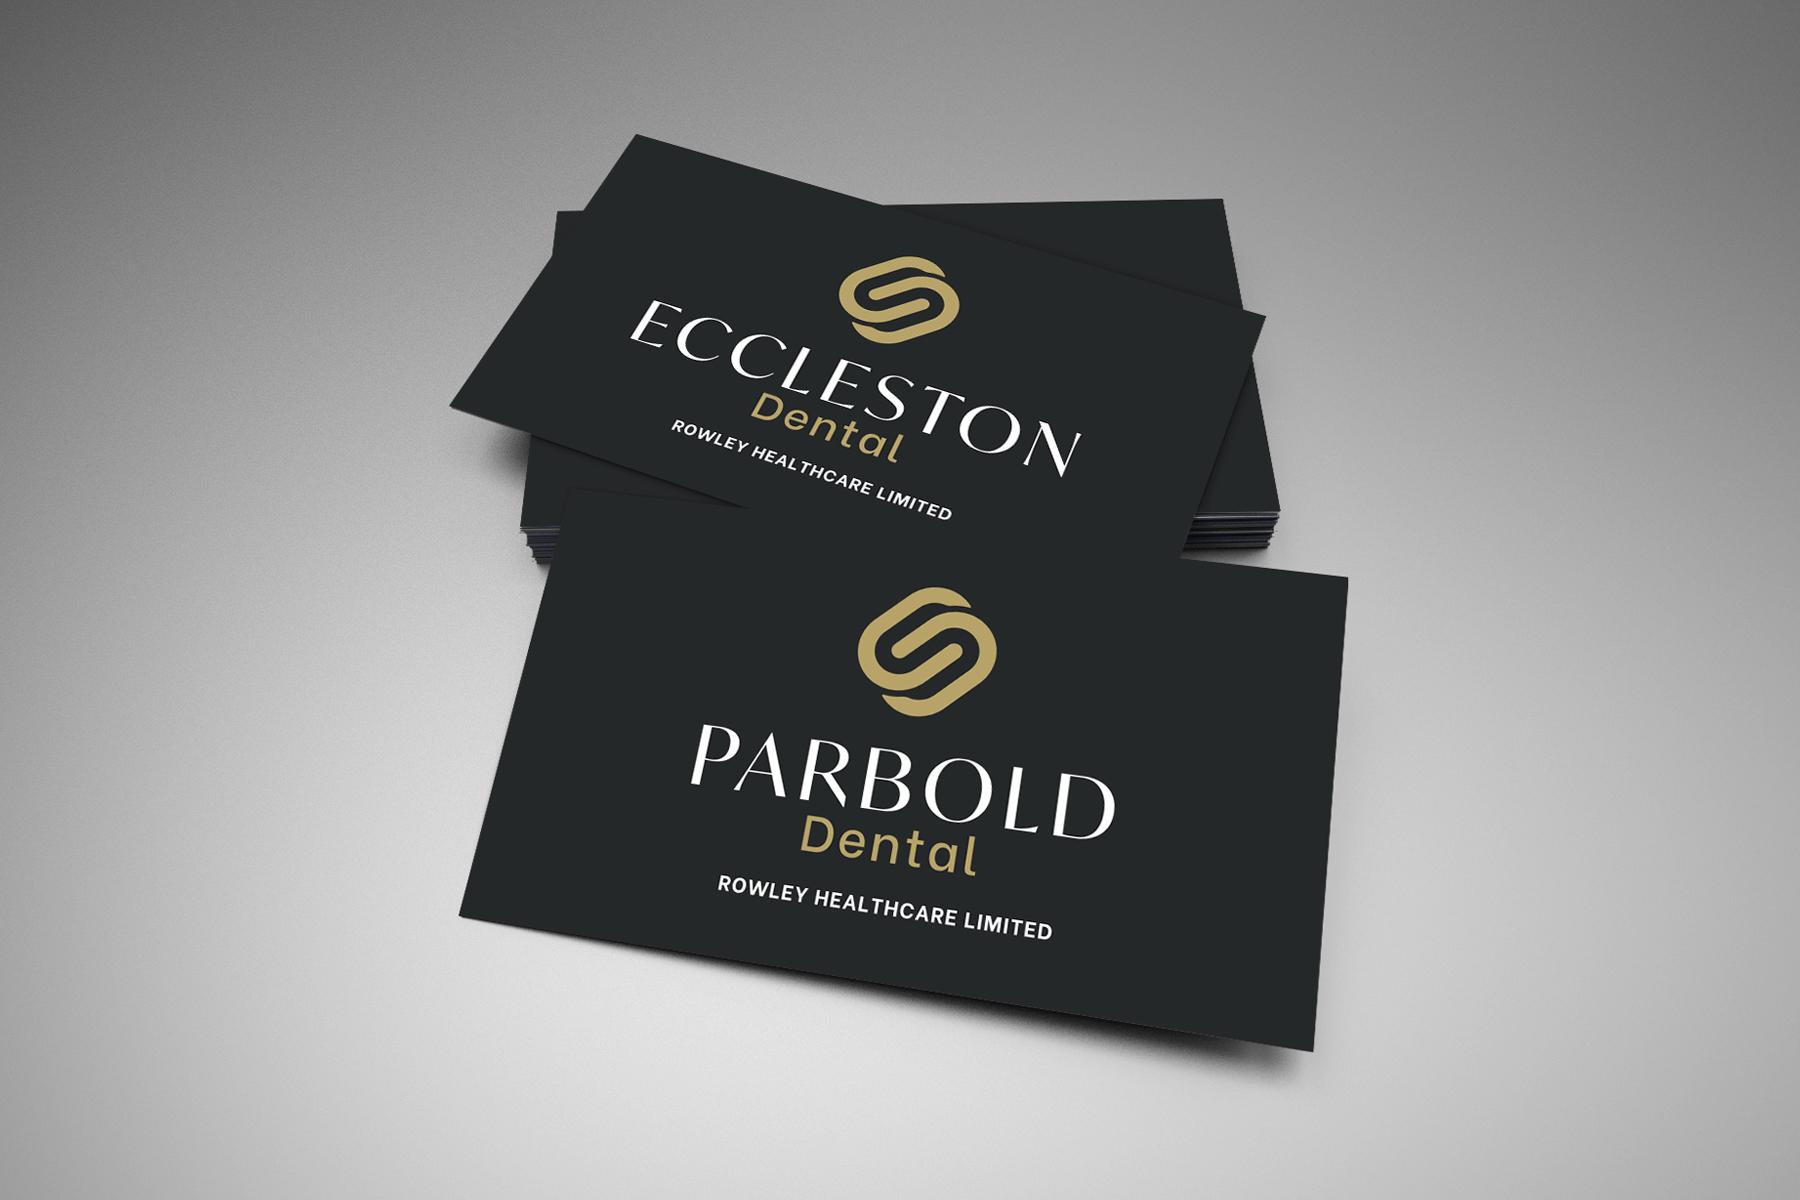 parbold-business-cards-for-website